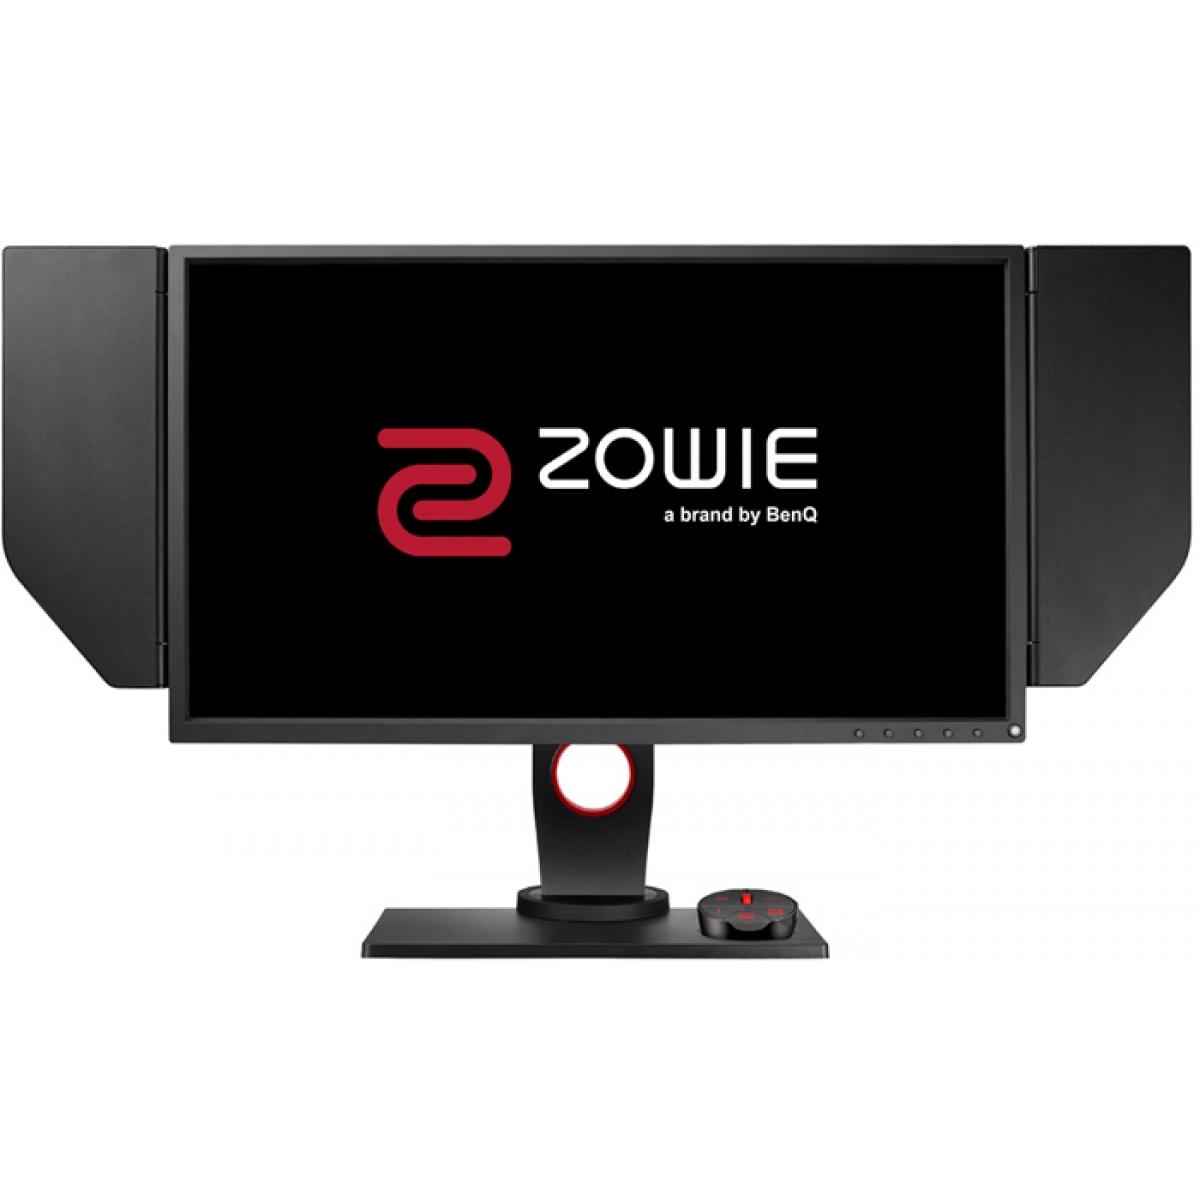 Monitor Gamer Benq Zowie 24.5 Pol, 144hz, 1ms, XL2536